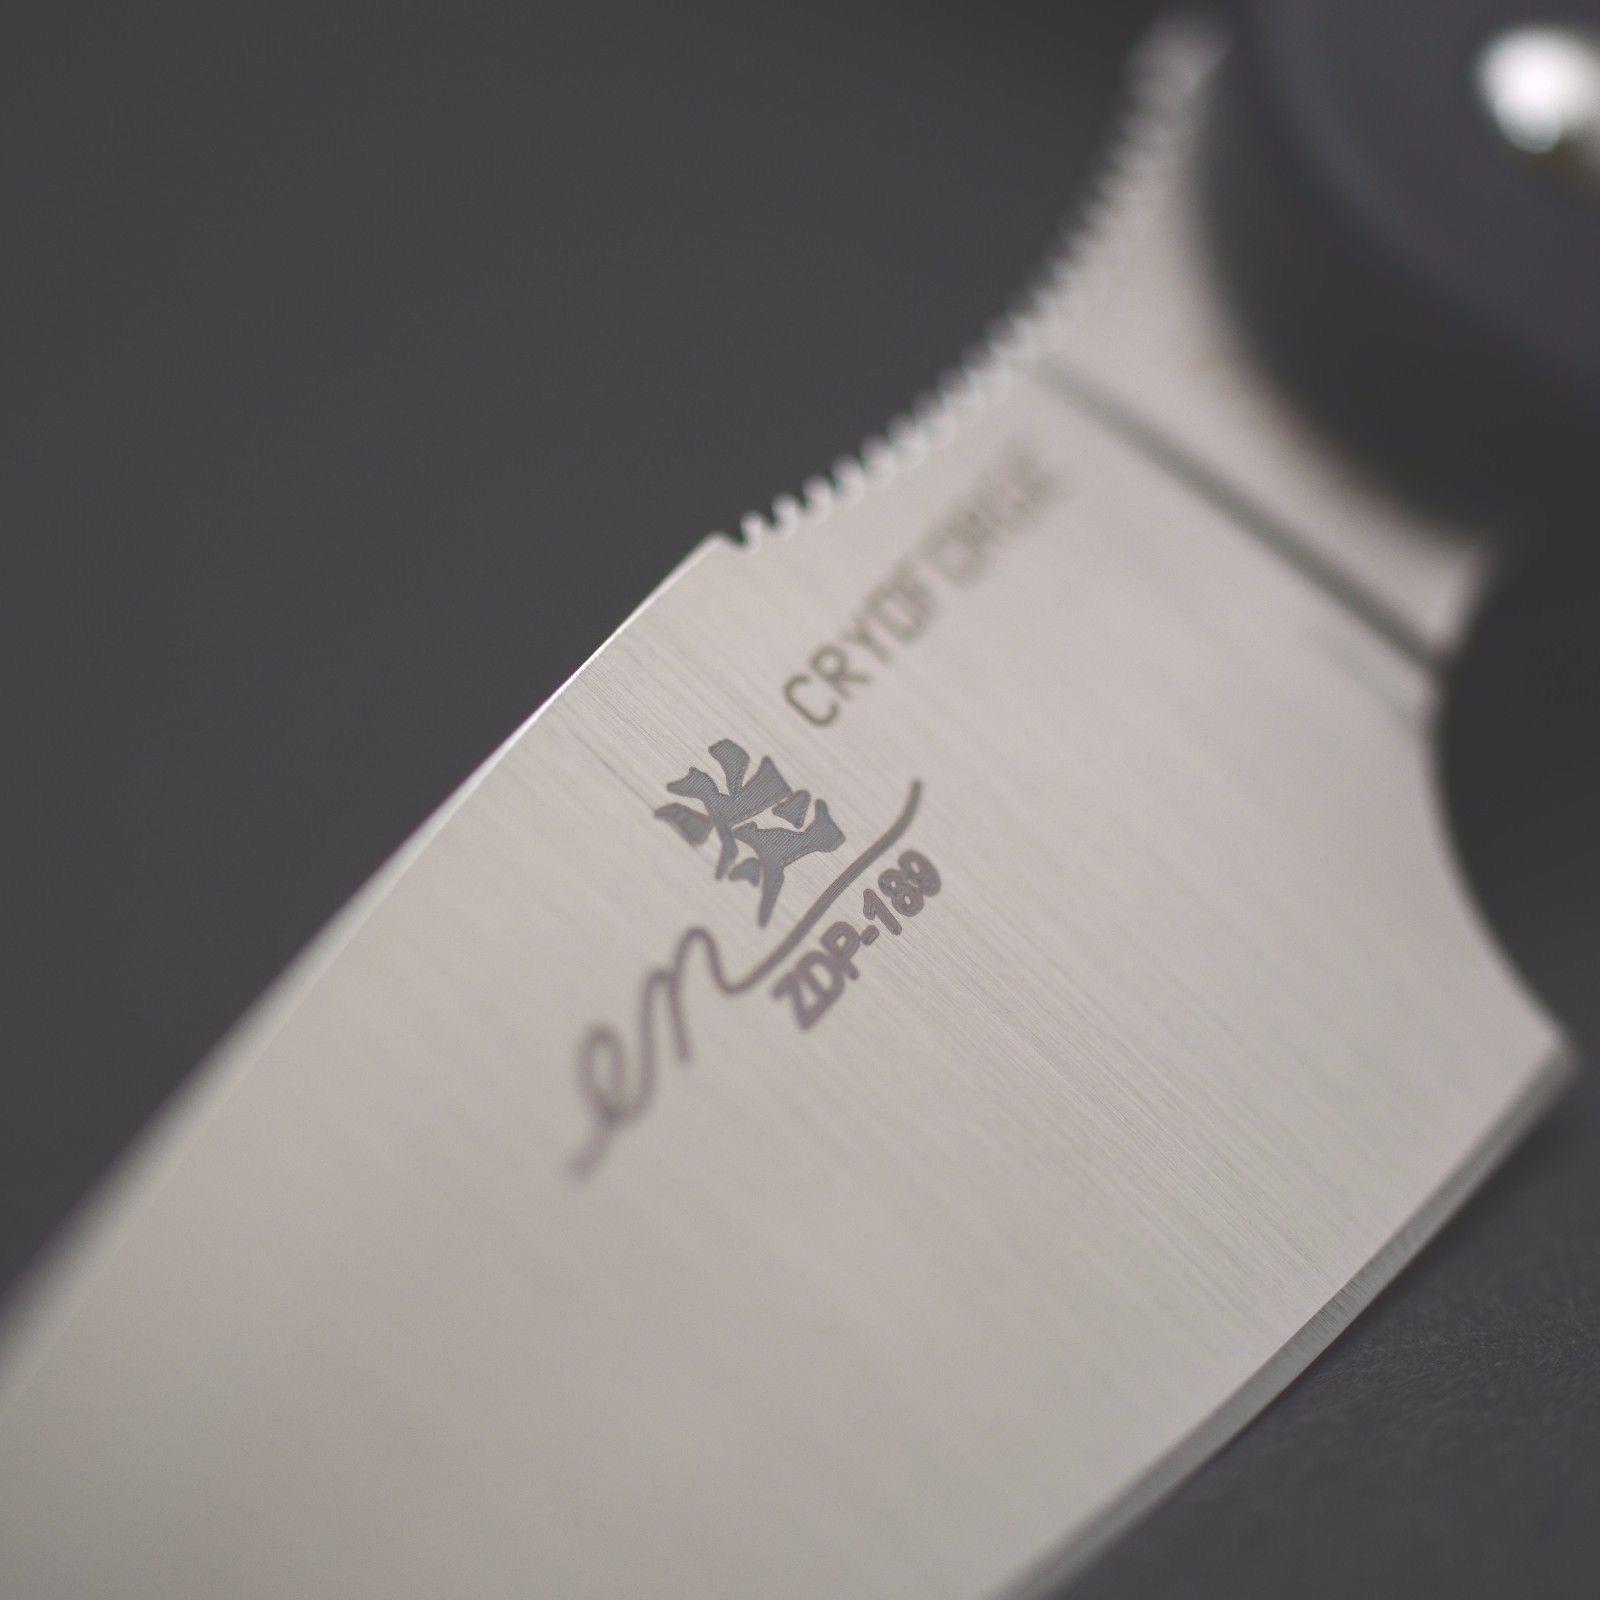 Фото 3 - Туристический нож G.Sakai, Camper En Fixed, ZDP-189, Black FRN